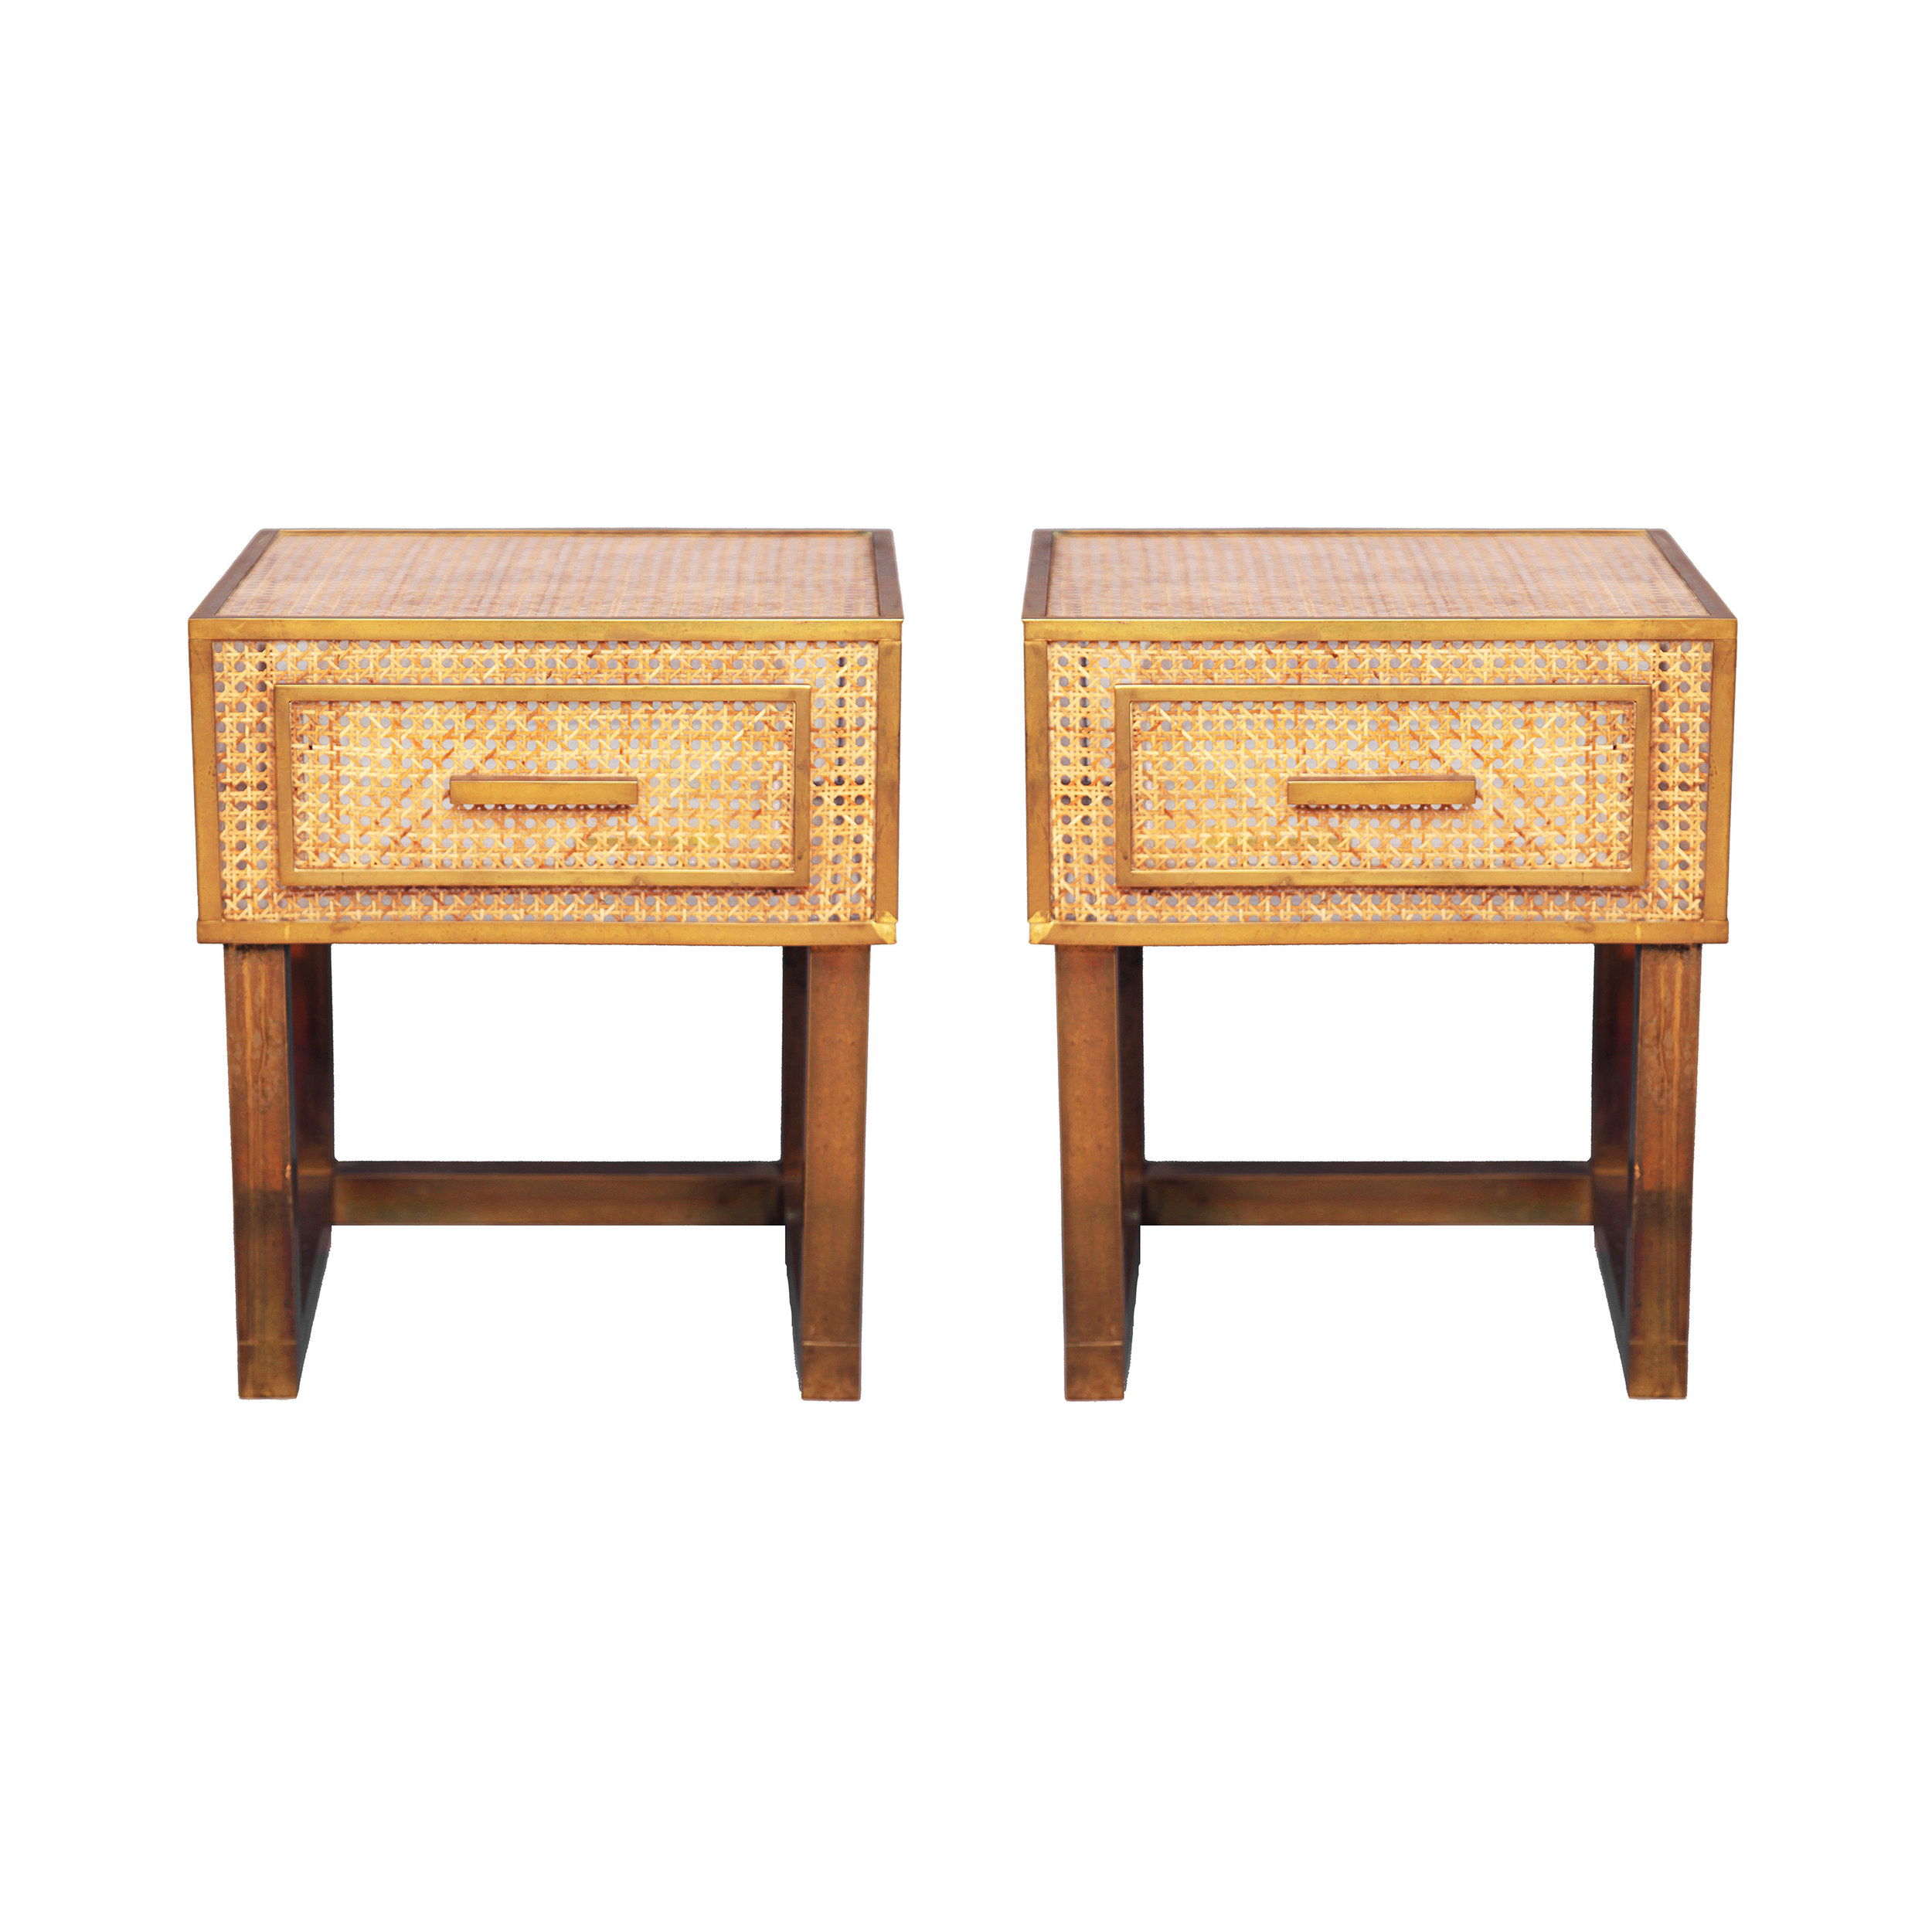 Gabriella Crespi for Dior Home Bedside Tables